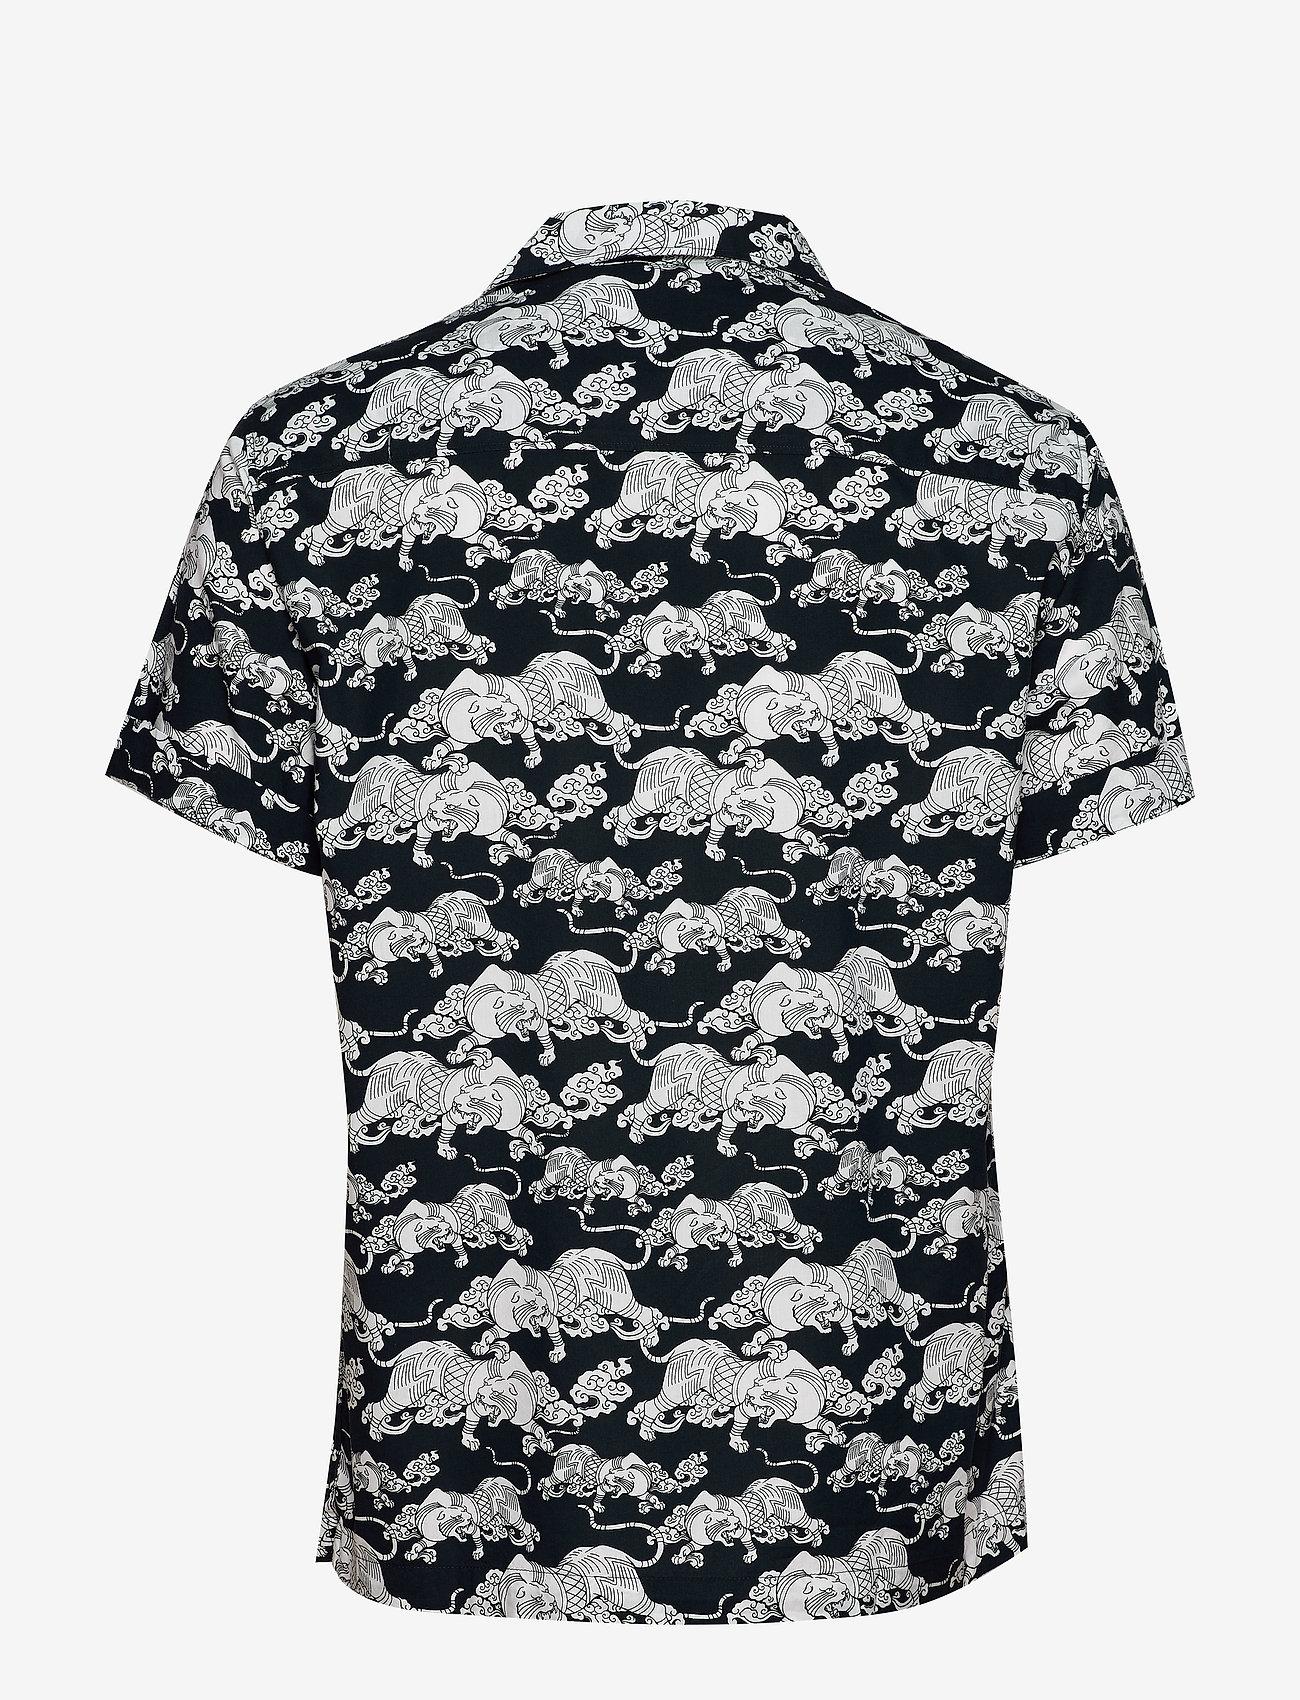 Hawaiian Box S/s Shirt (Navy Aop) (524.25 kr) - Superdry